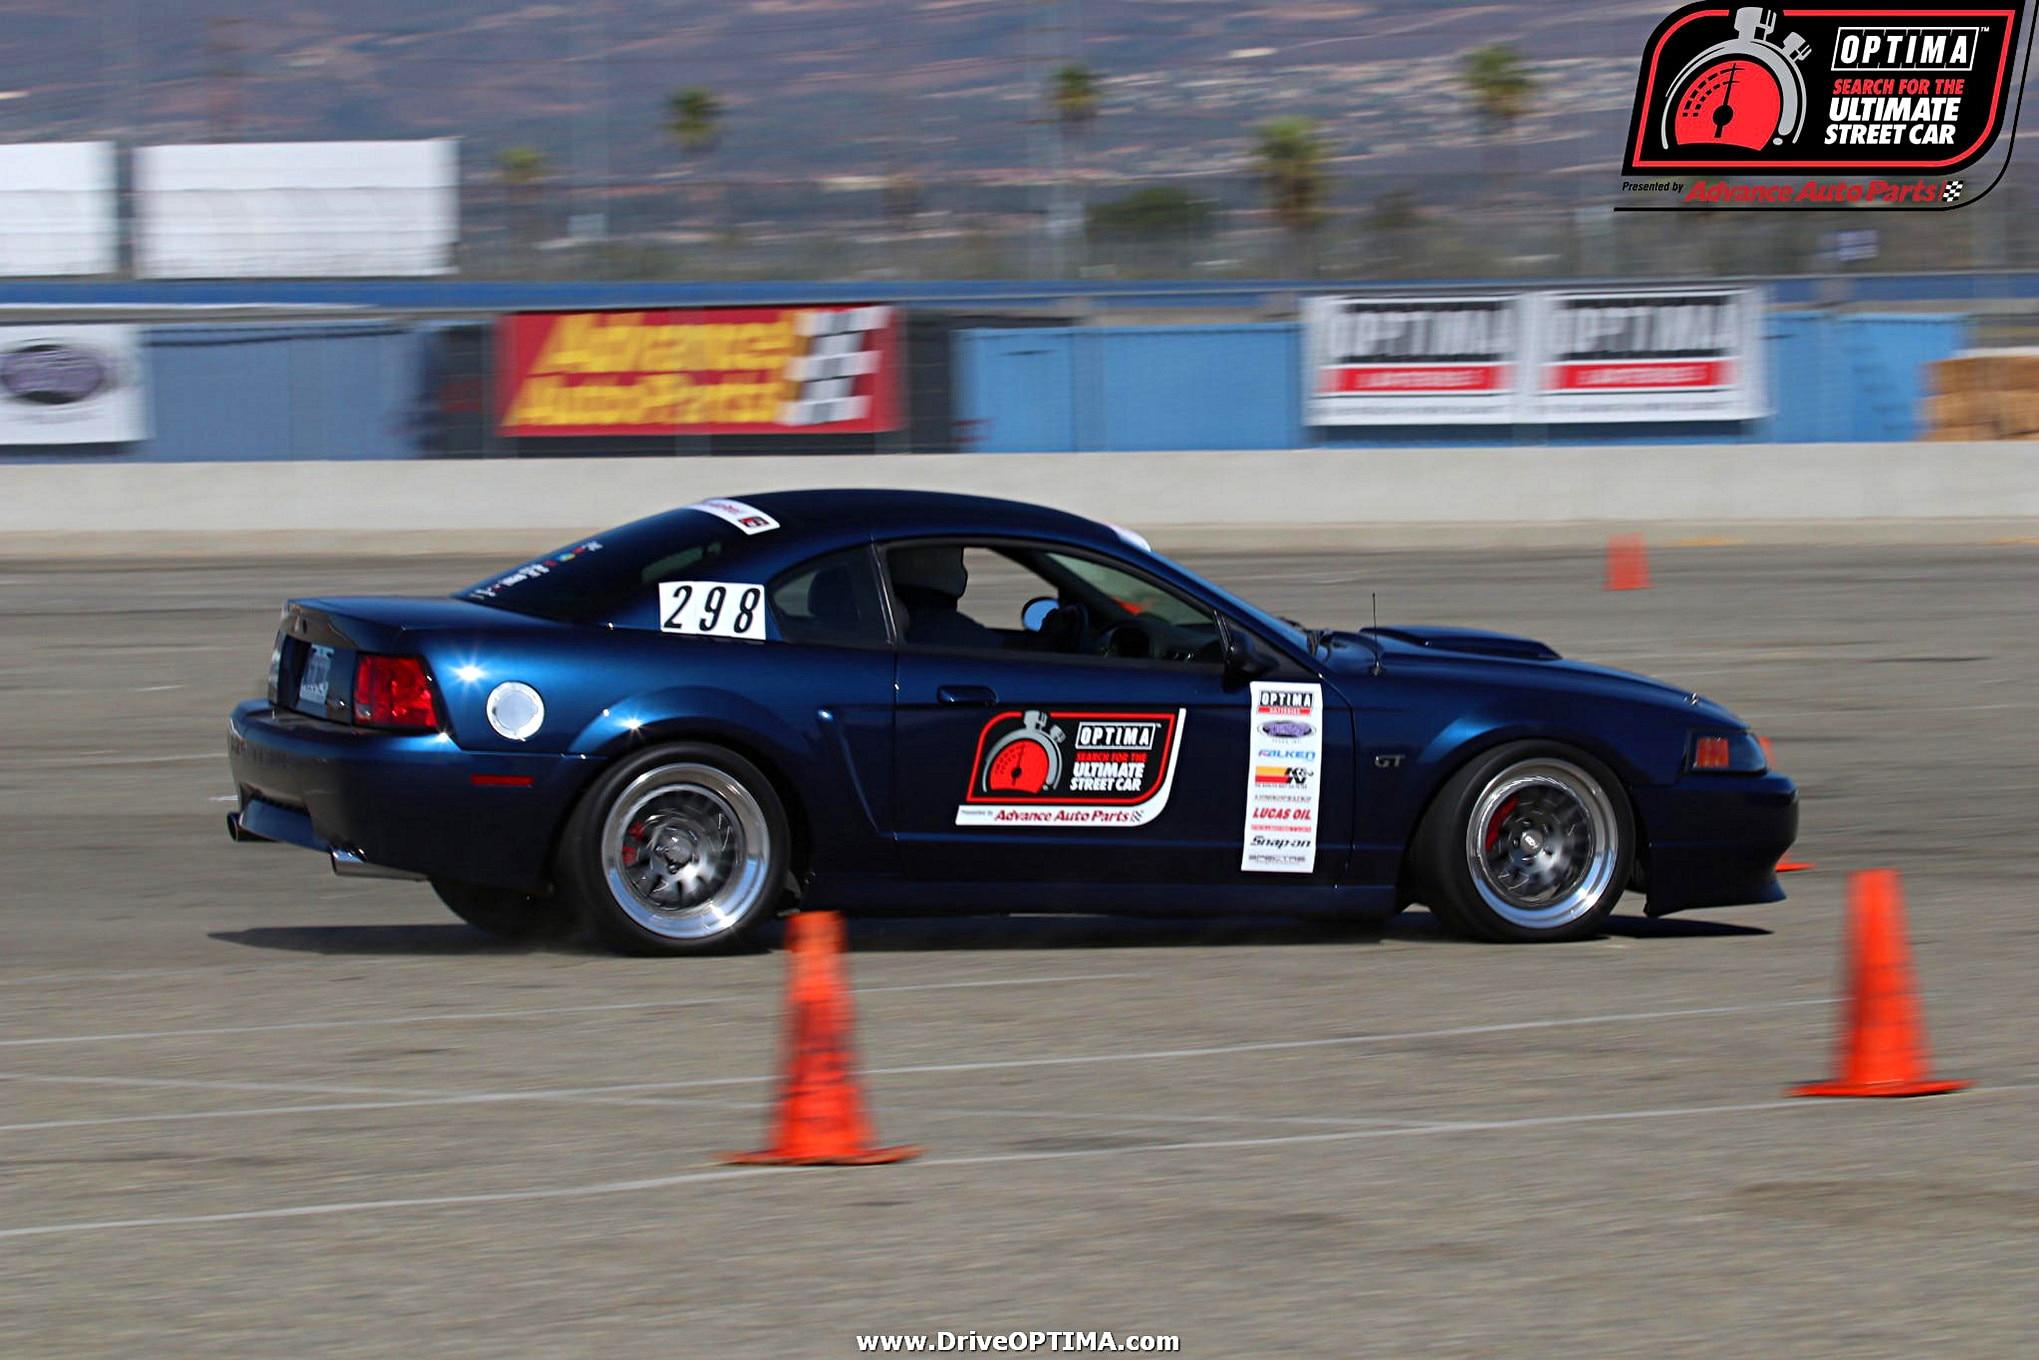 MMFF Nasario Birrueta 2001 Ford Mustang Saturday DriveOPTIMA Fontana 2016 43